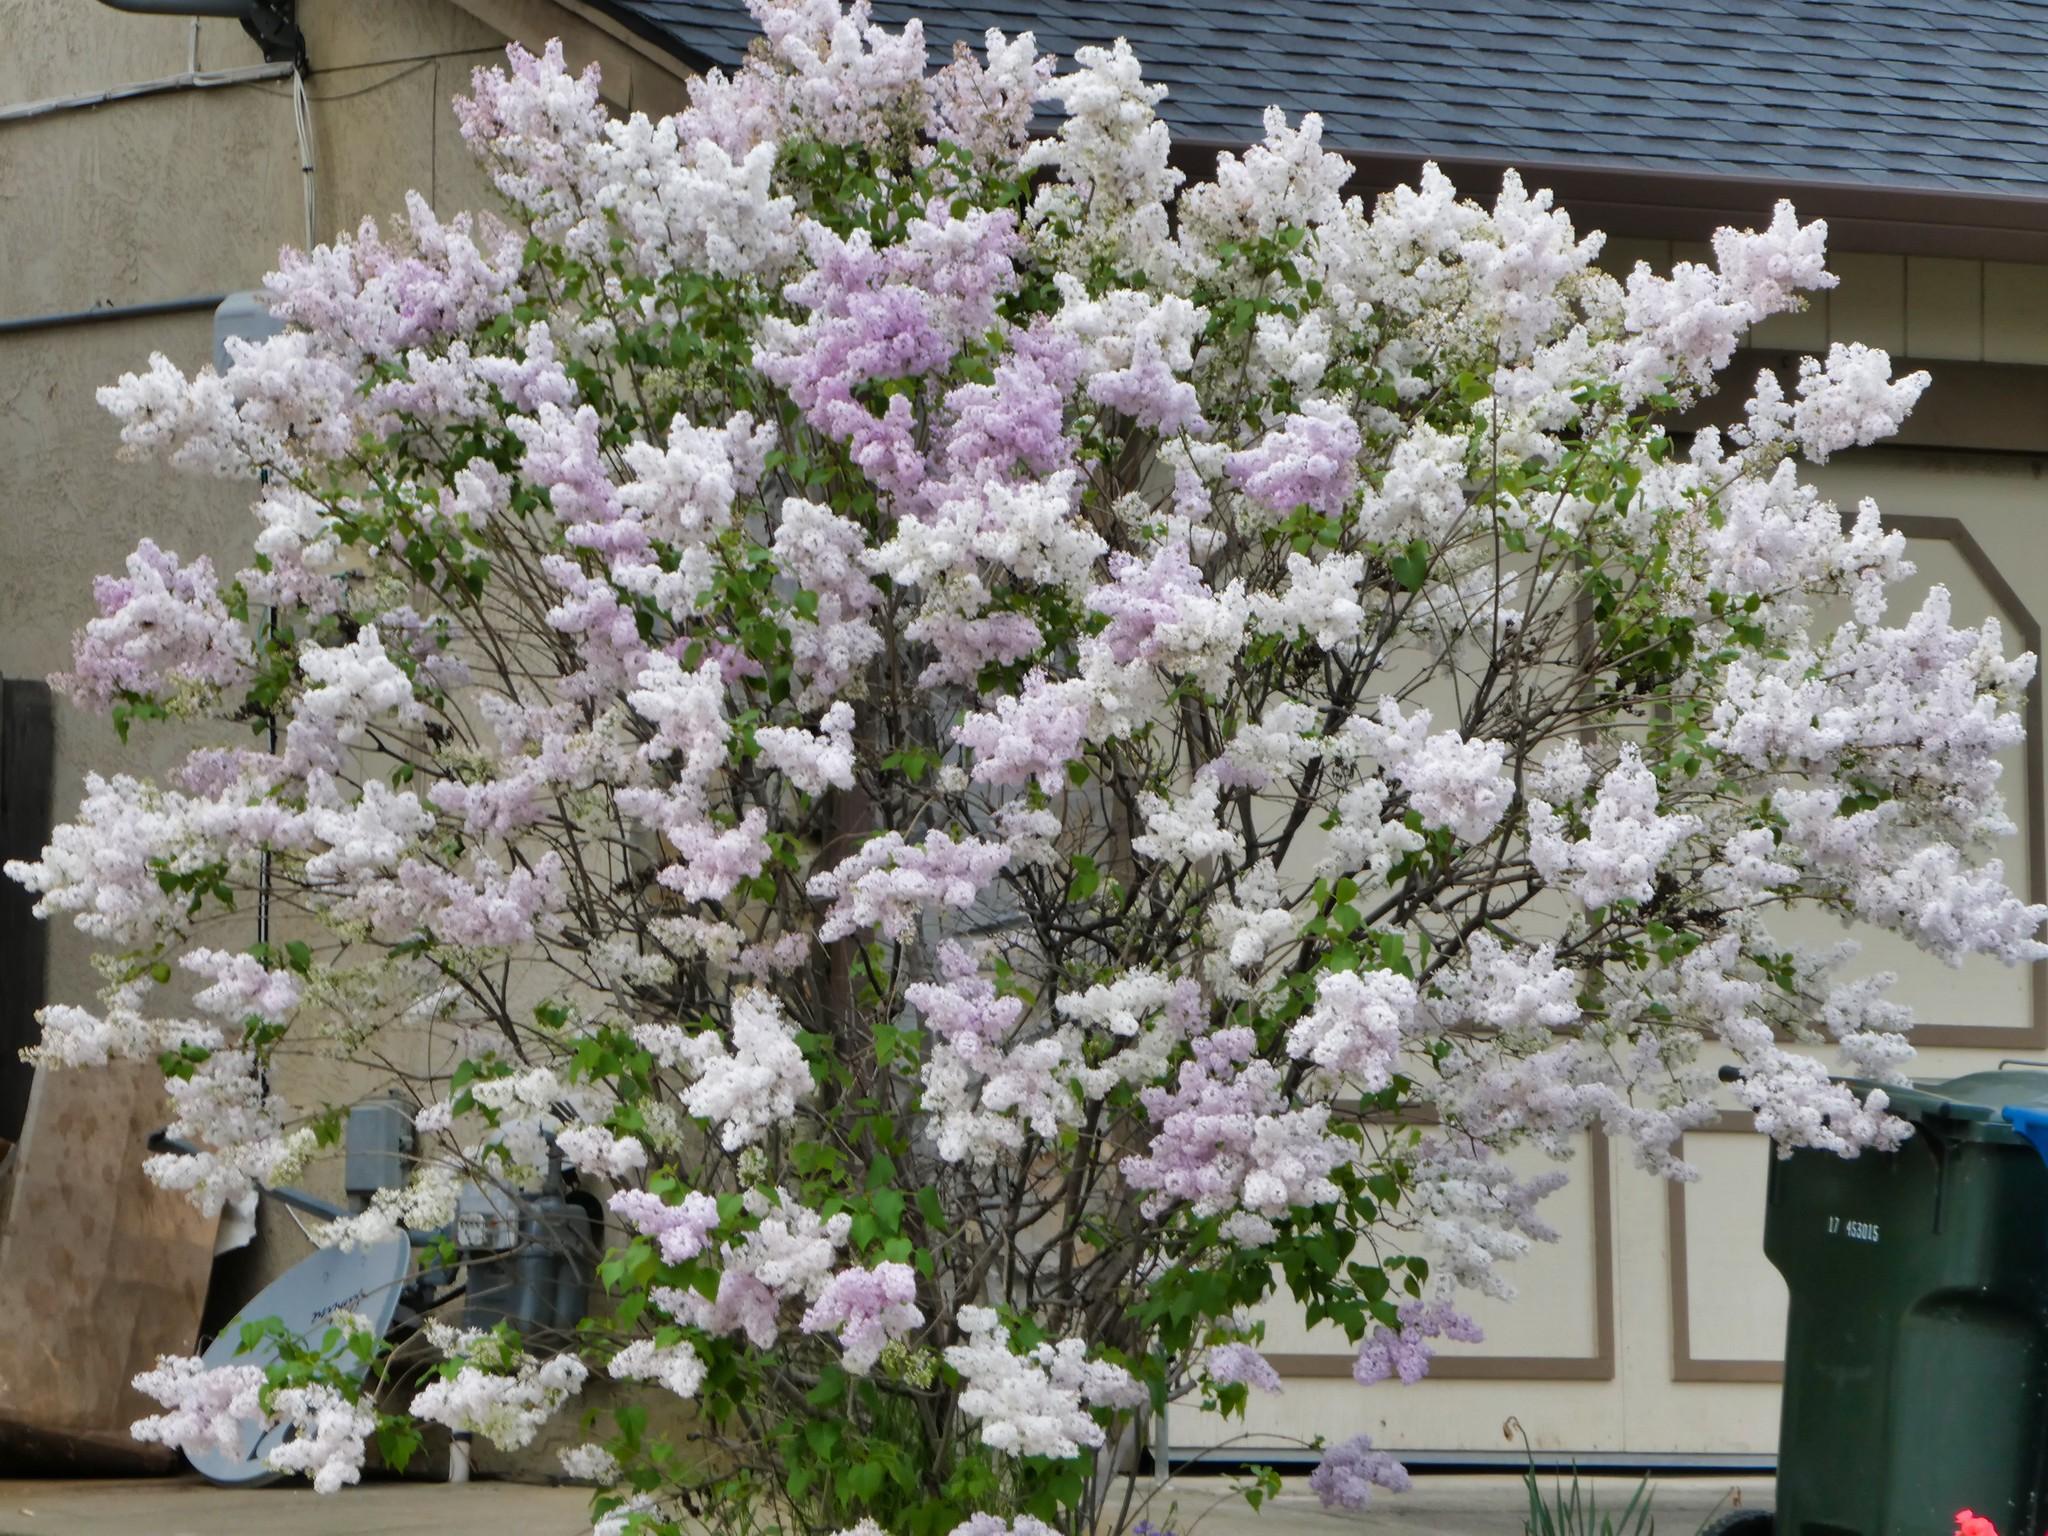 2019-04-11 - Landscape Photography - Front Yards - Flowers & Decorations